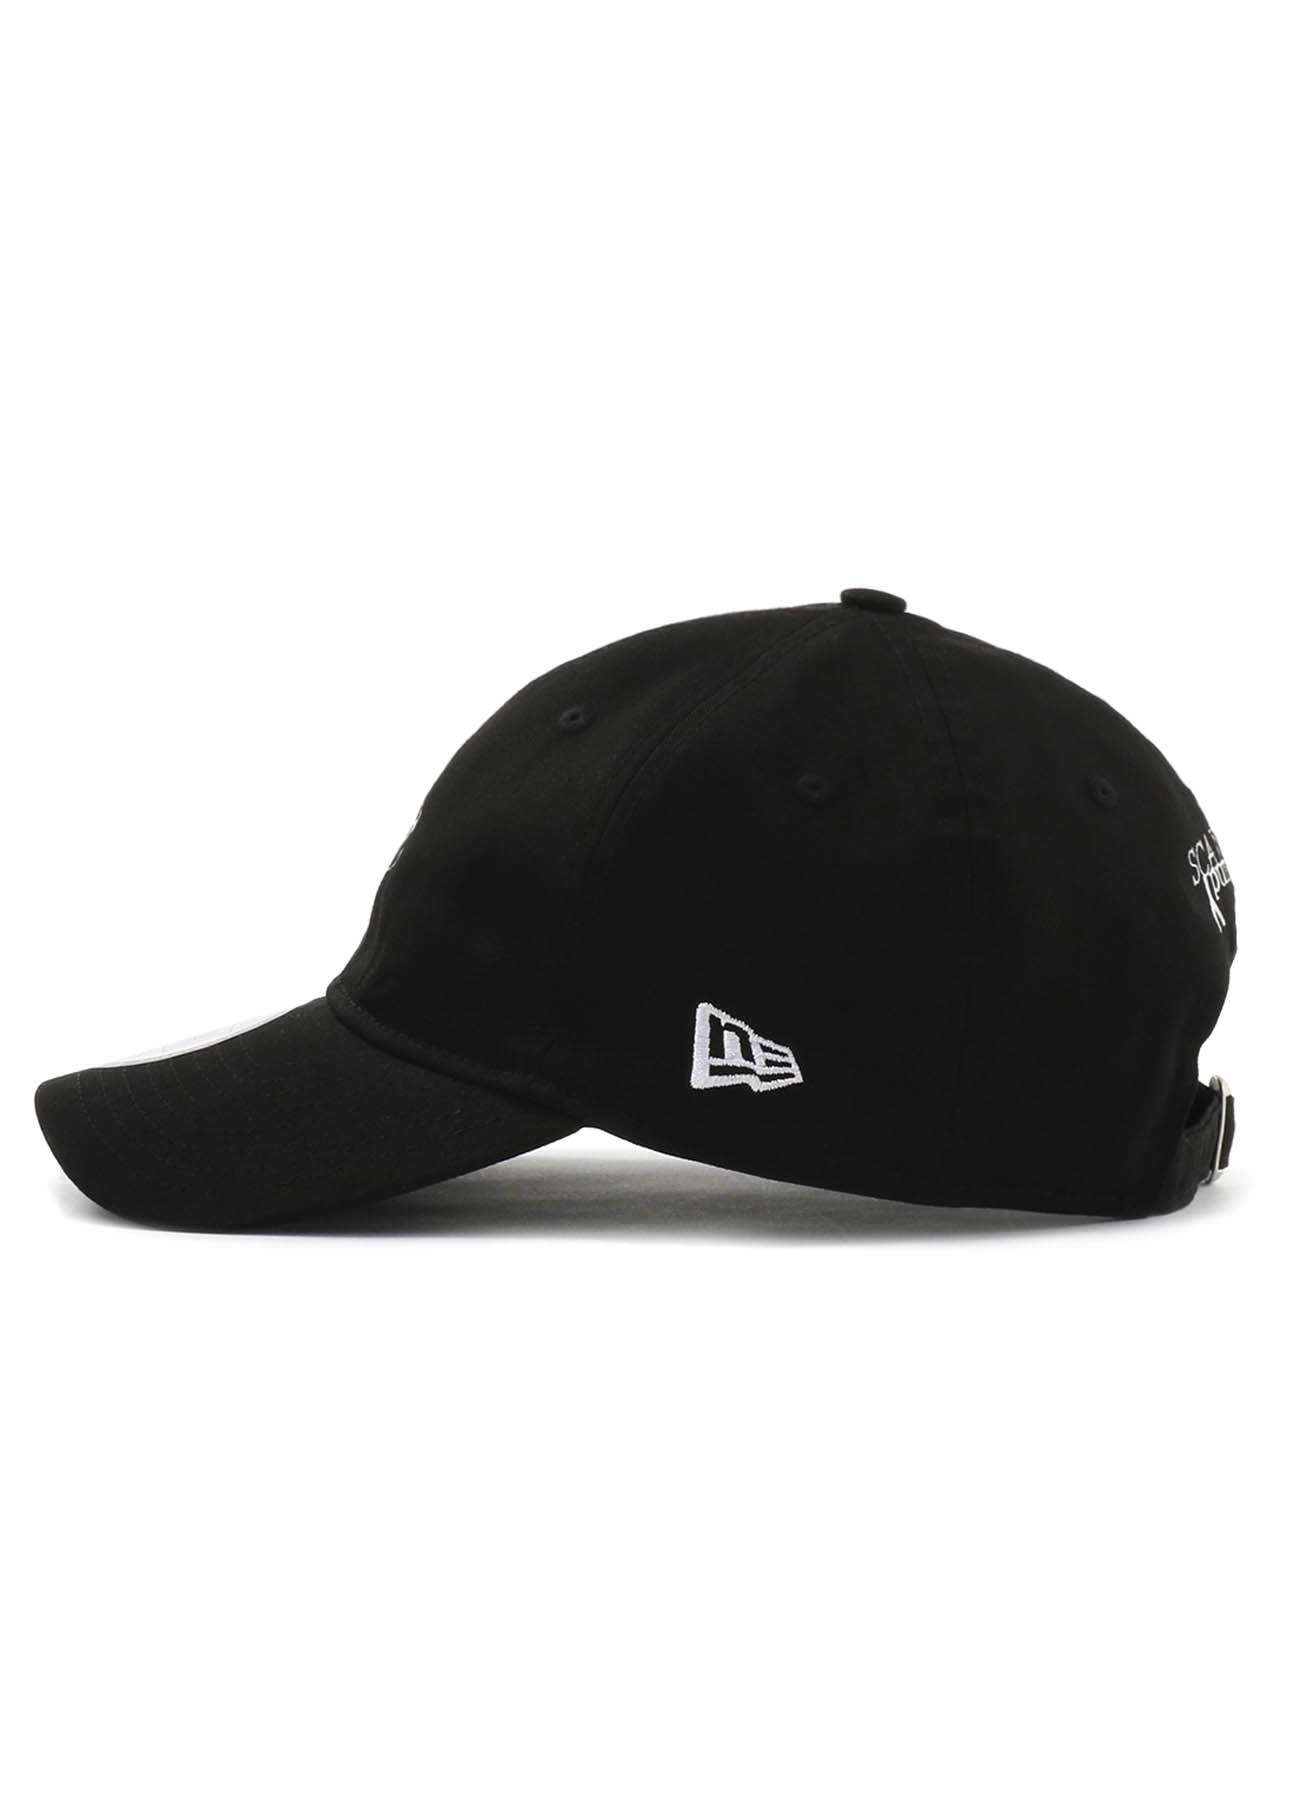 GroundY×SCANDAL×NEW ERA 9THIRTY 鸭舌帽